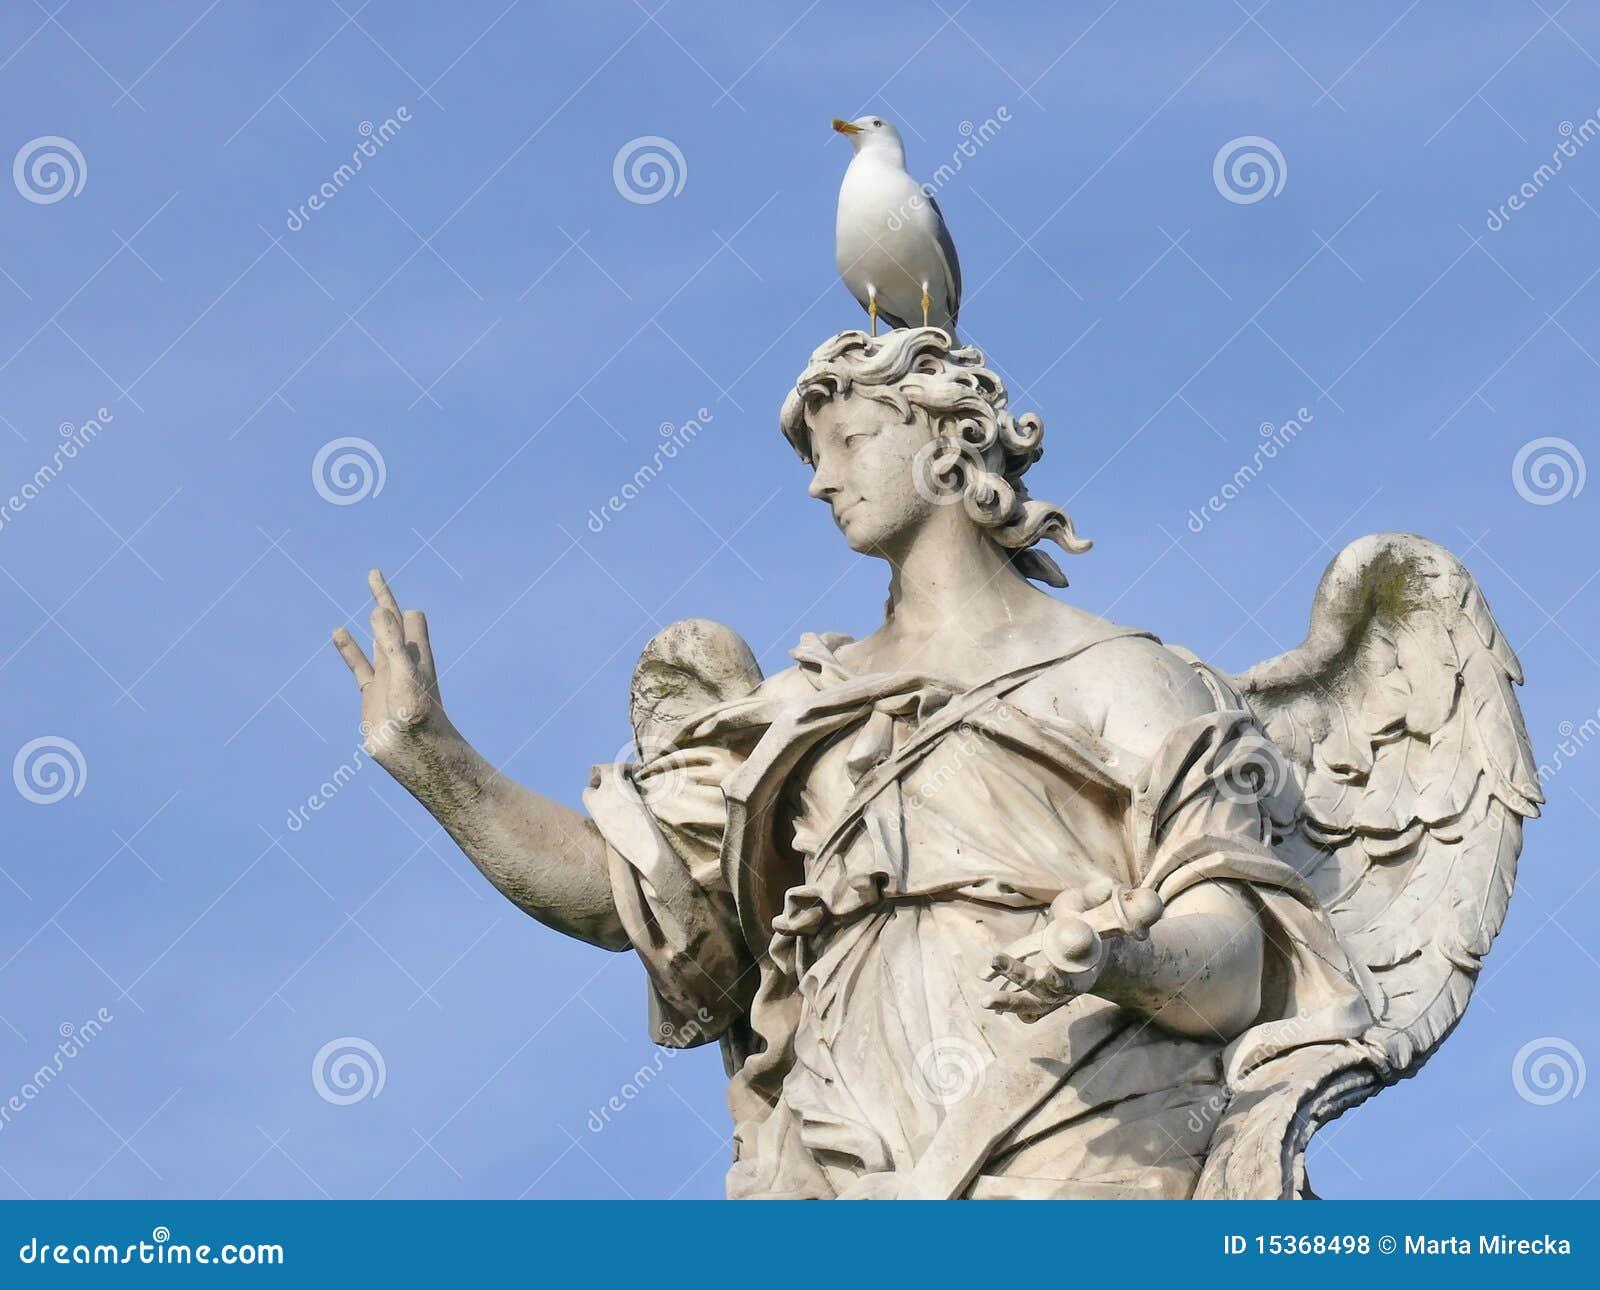 Ángel de mármol. Puente de Michaelangelo. Roma.